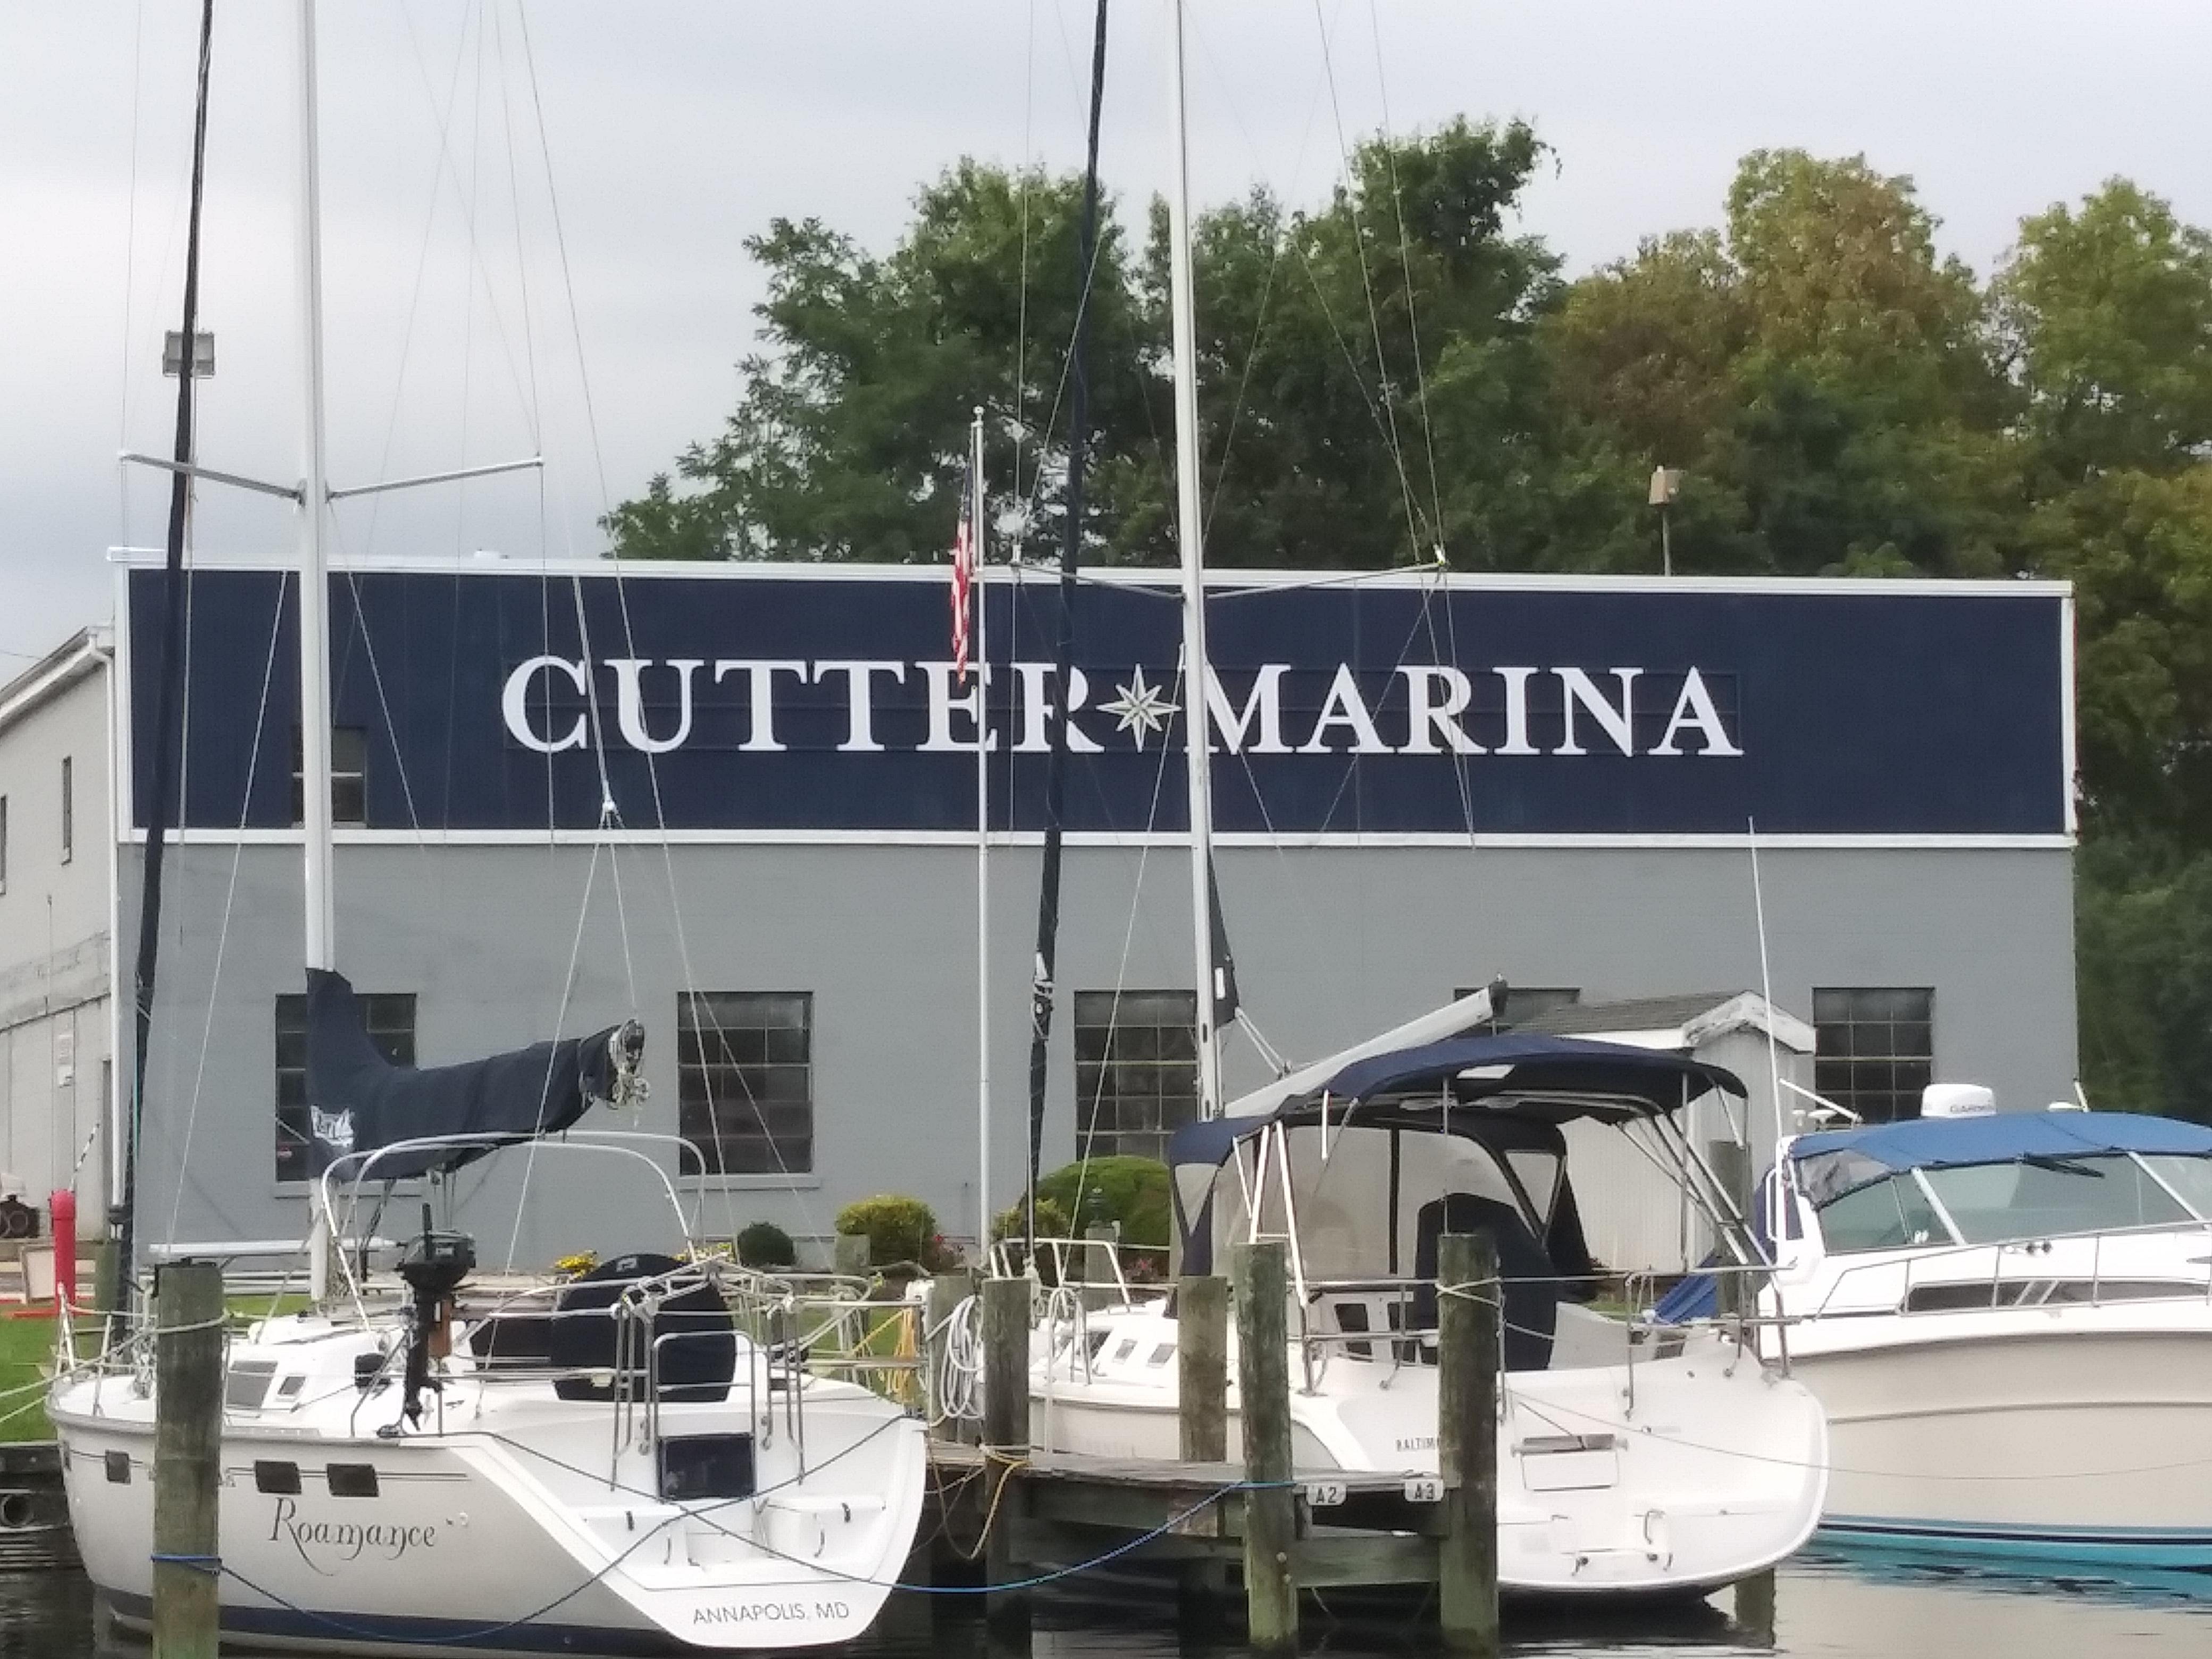 Cutter Marina, Essex, Maryland